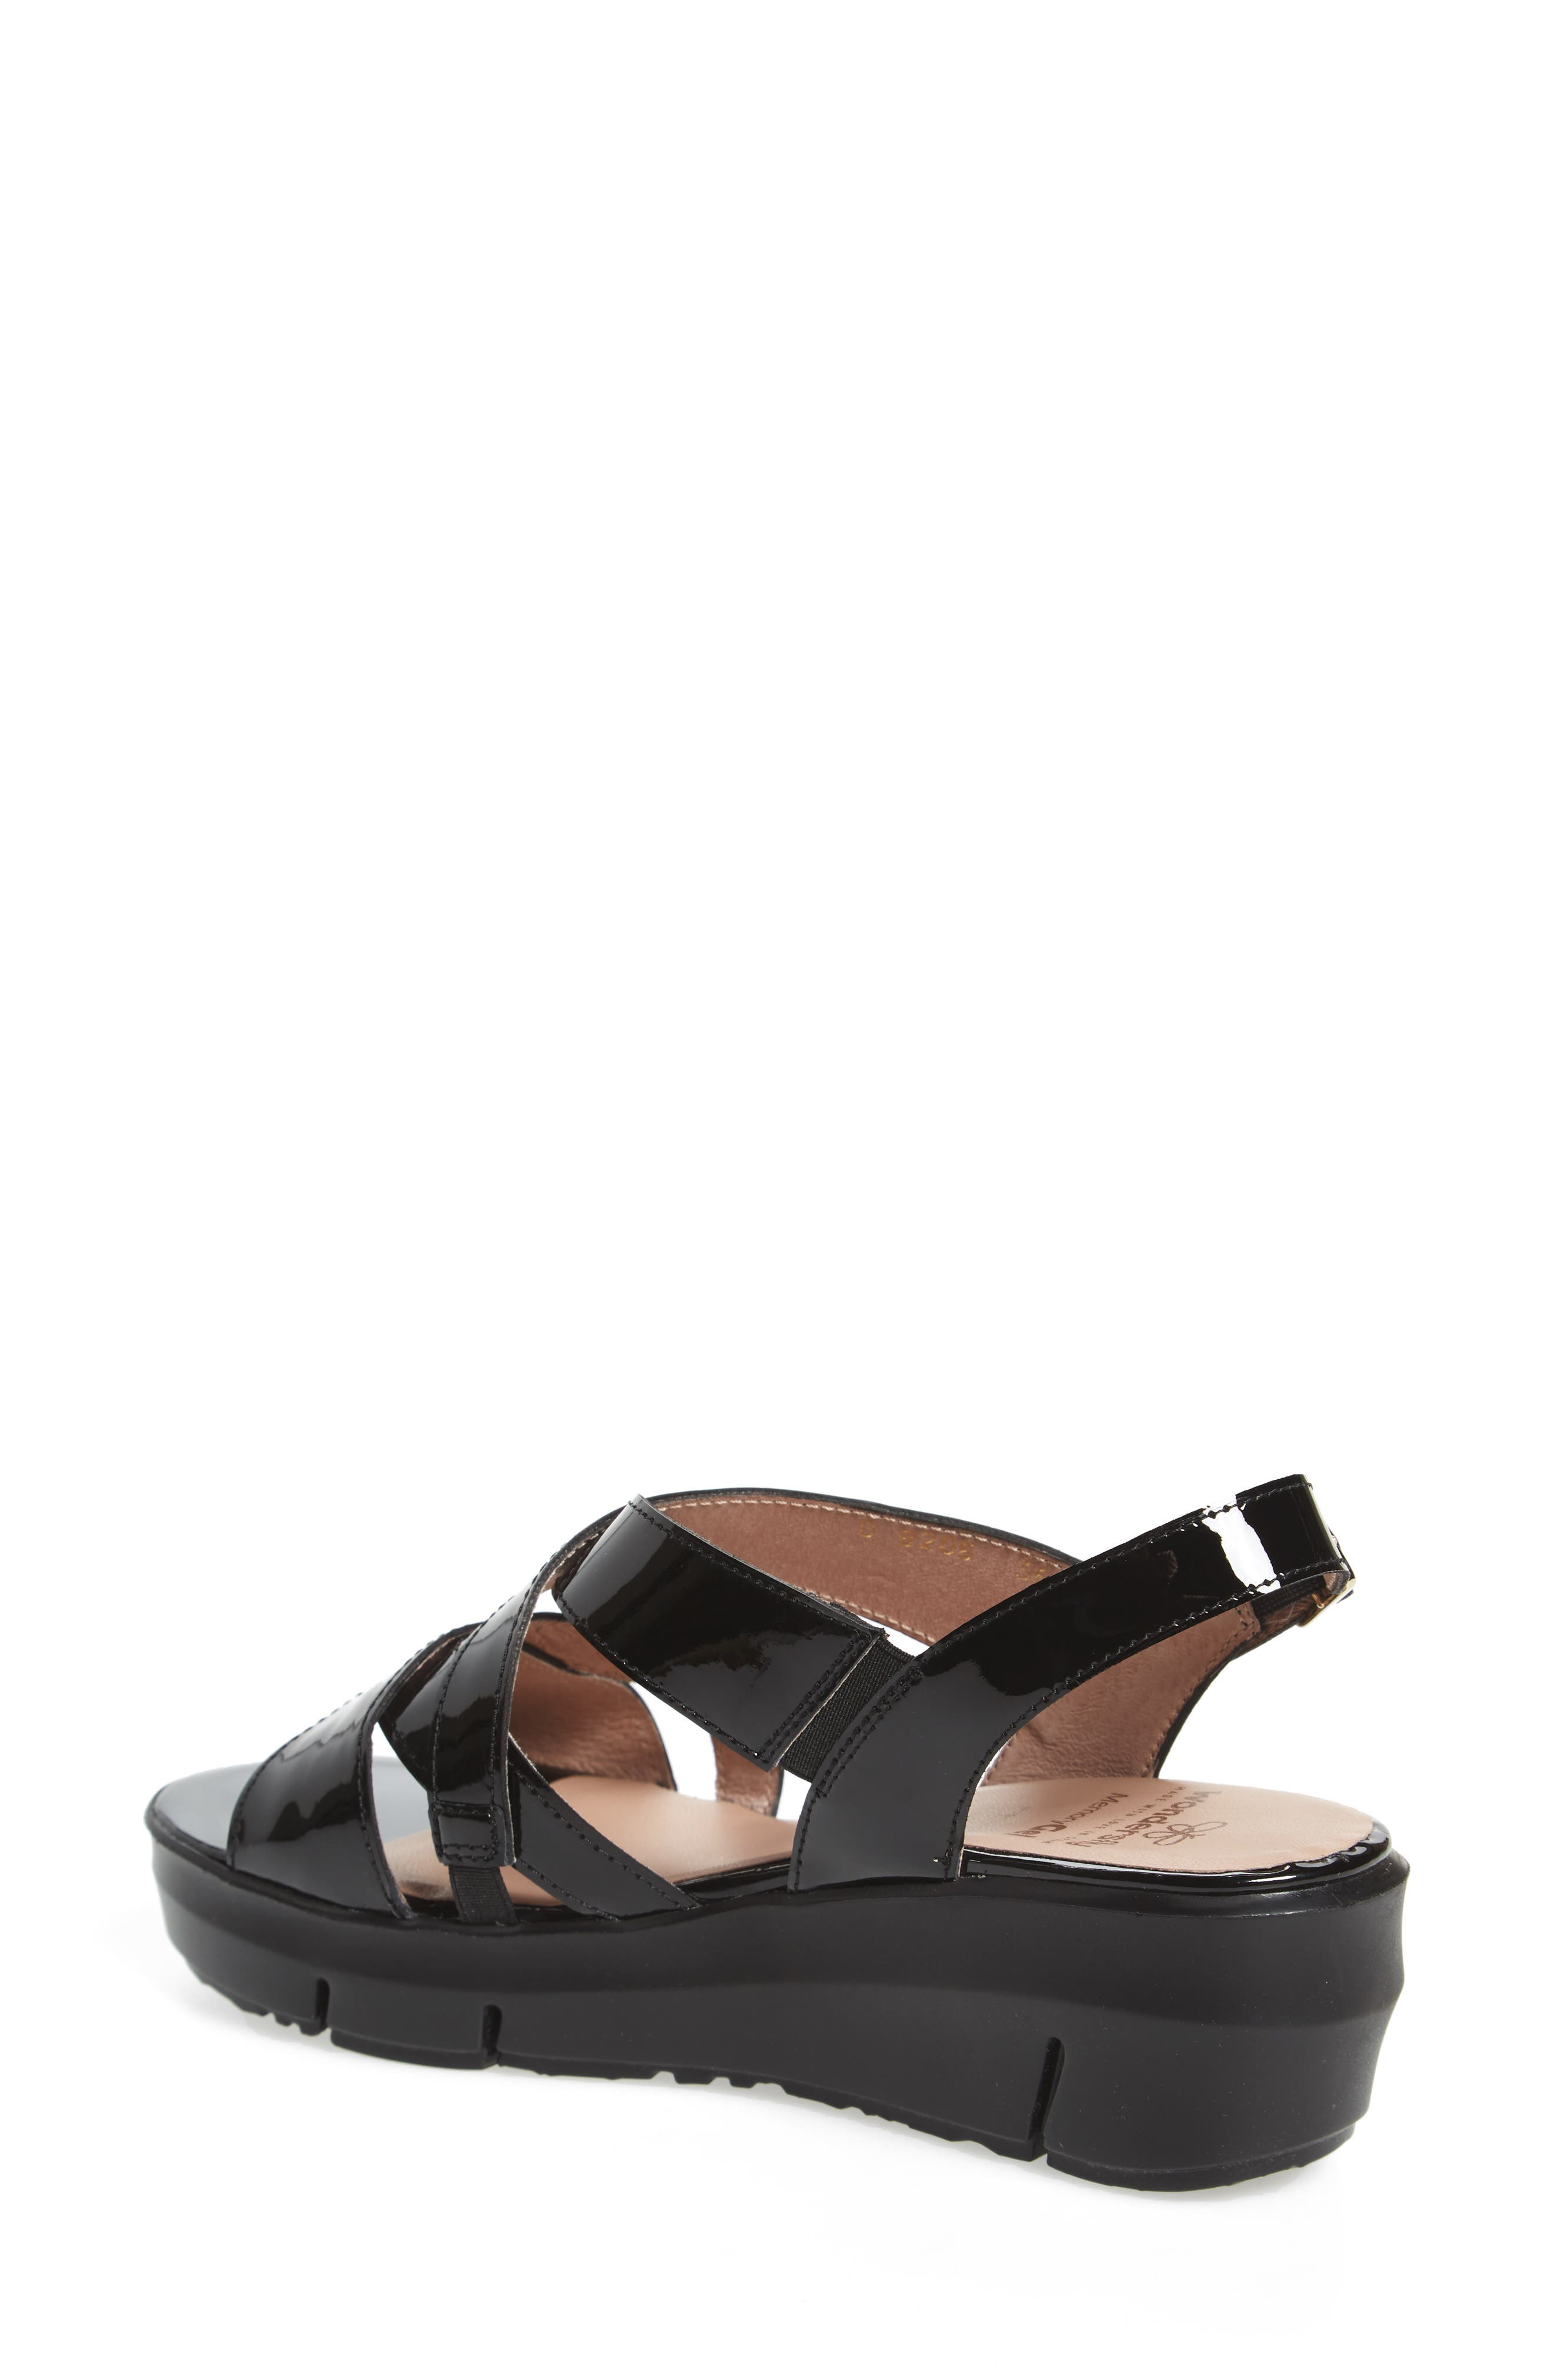 Platform Wedge Sandal,                             Alternate thumbnail 2, color,                             BLACK LEATHER